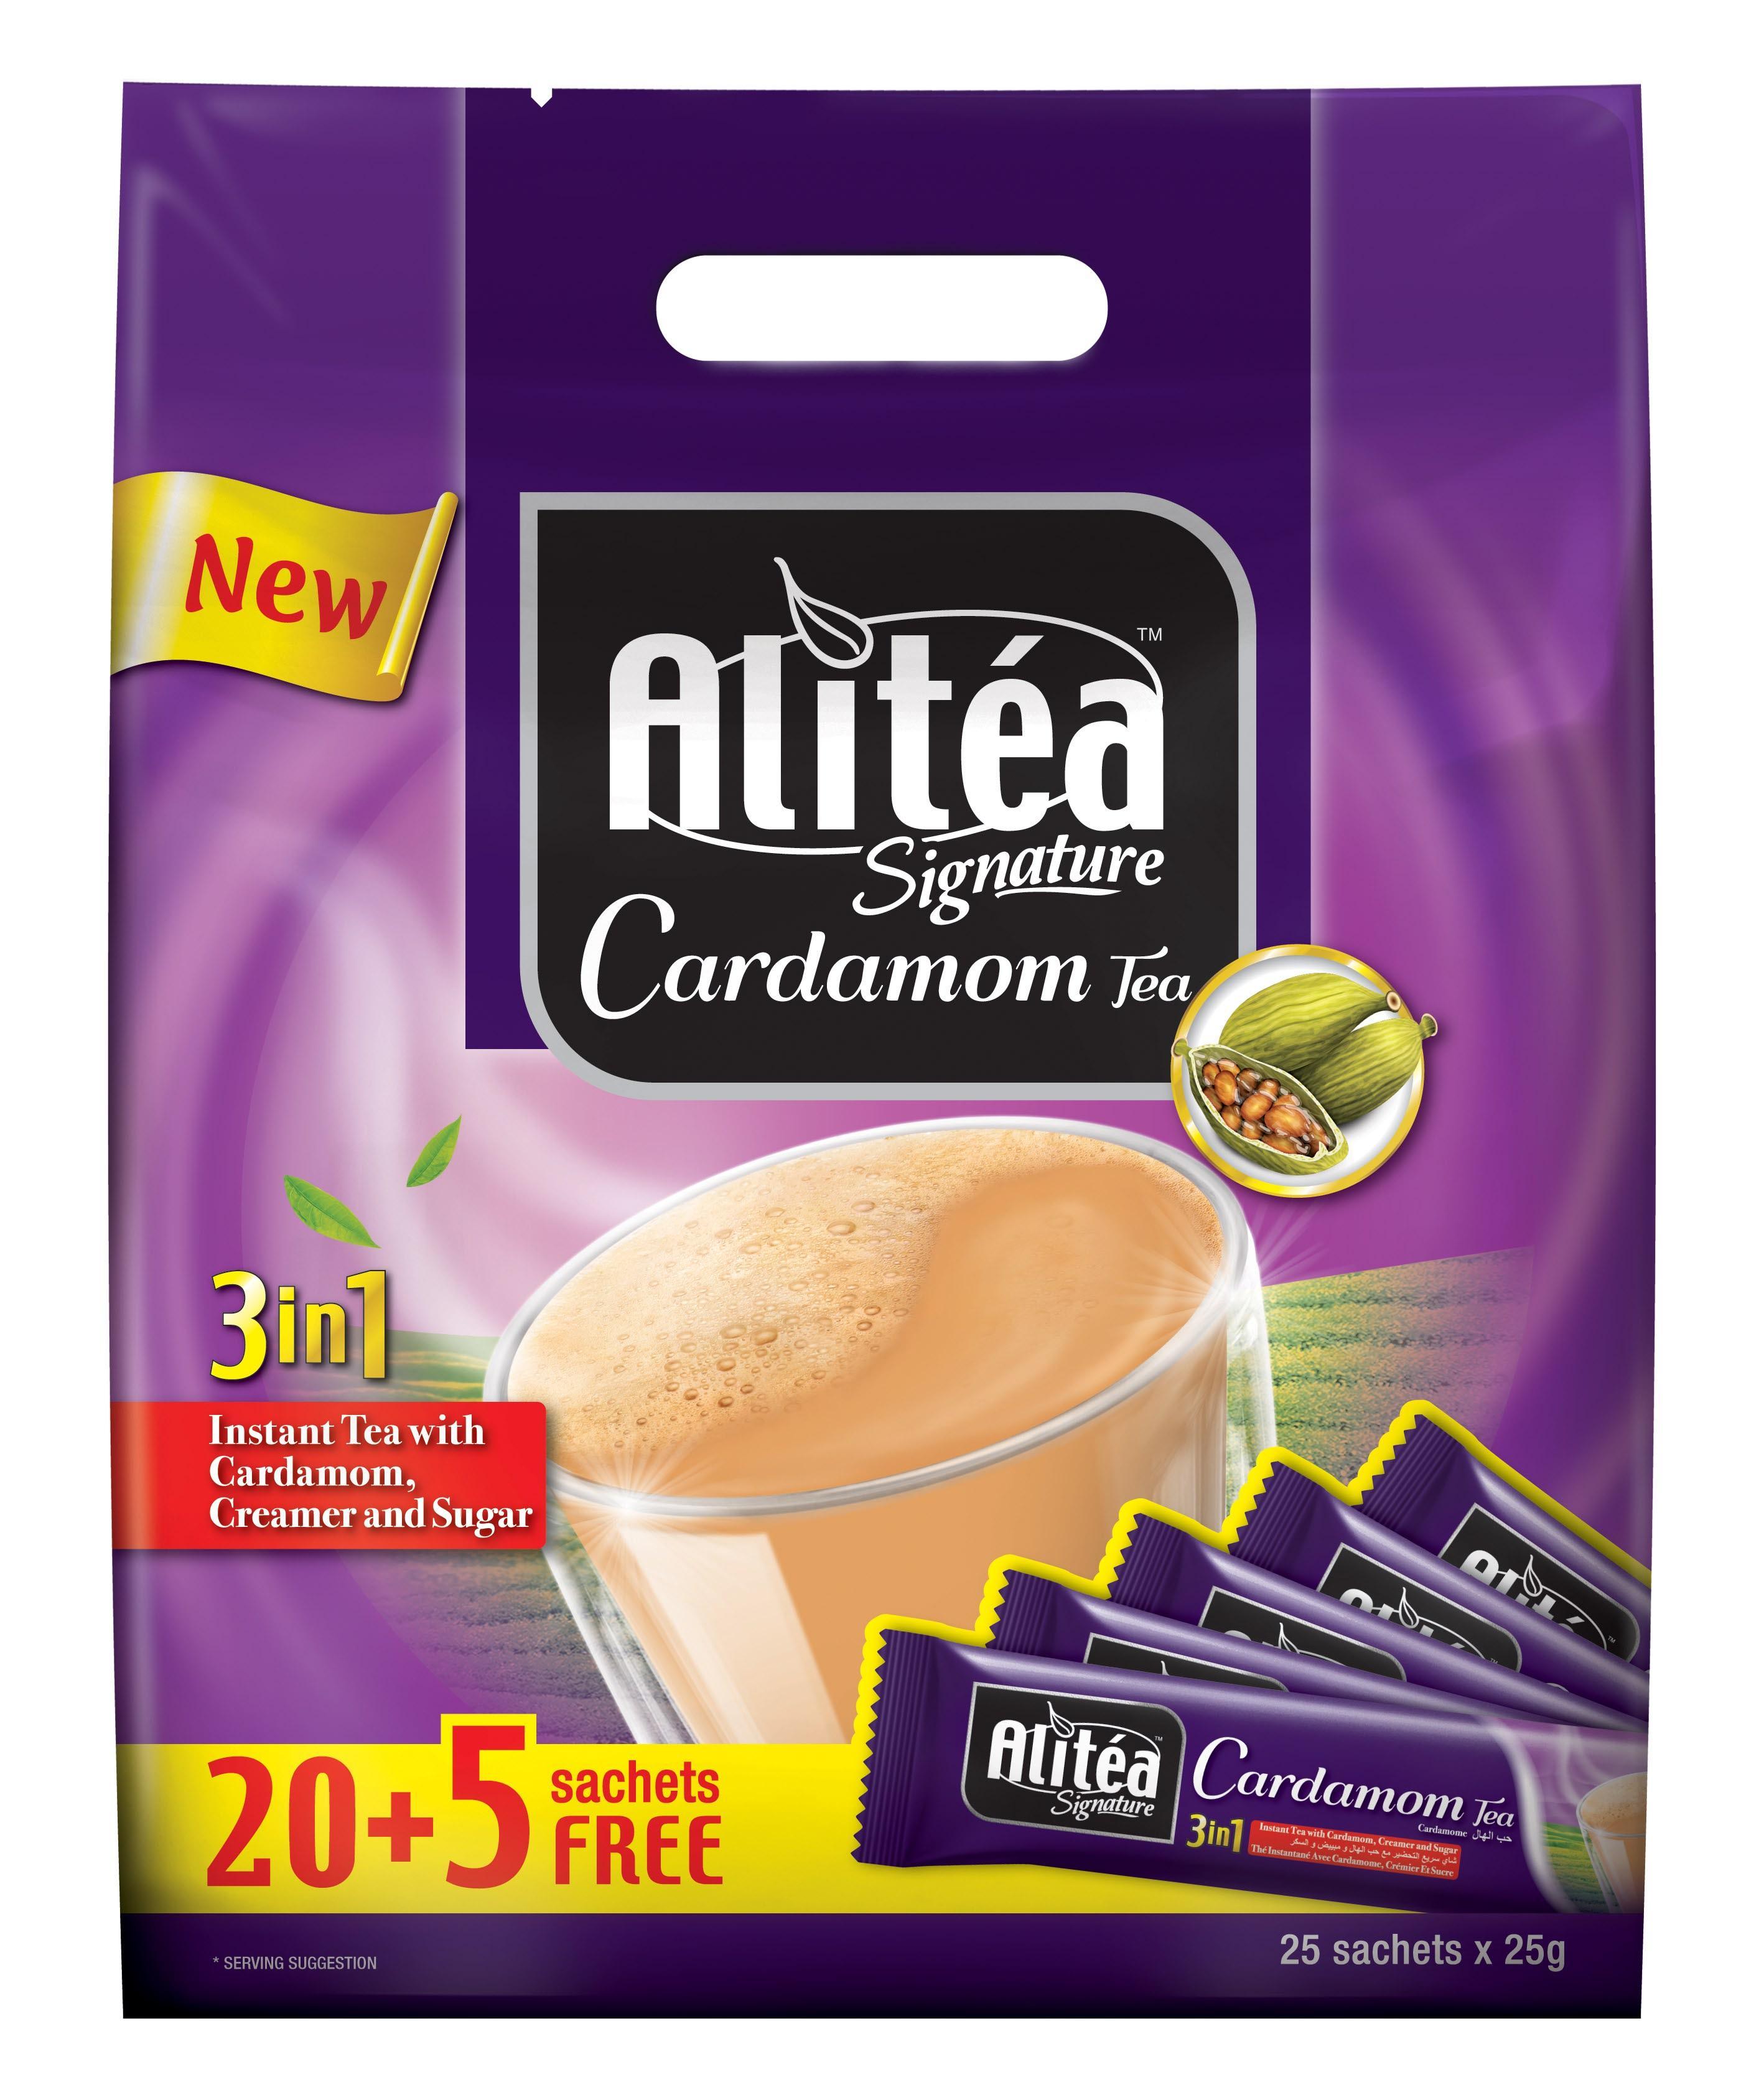 Alitéa Signature Cardamom Tea